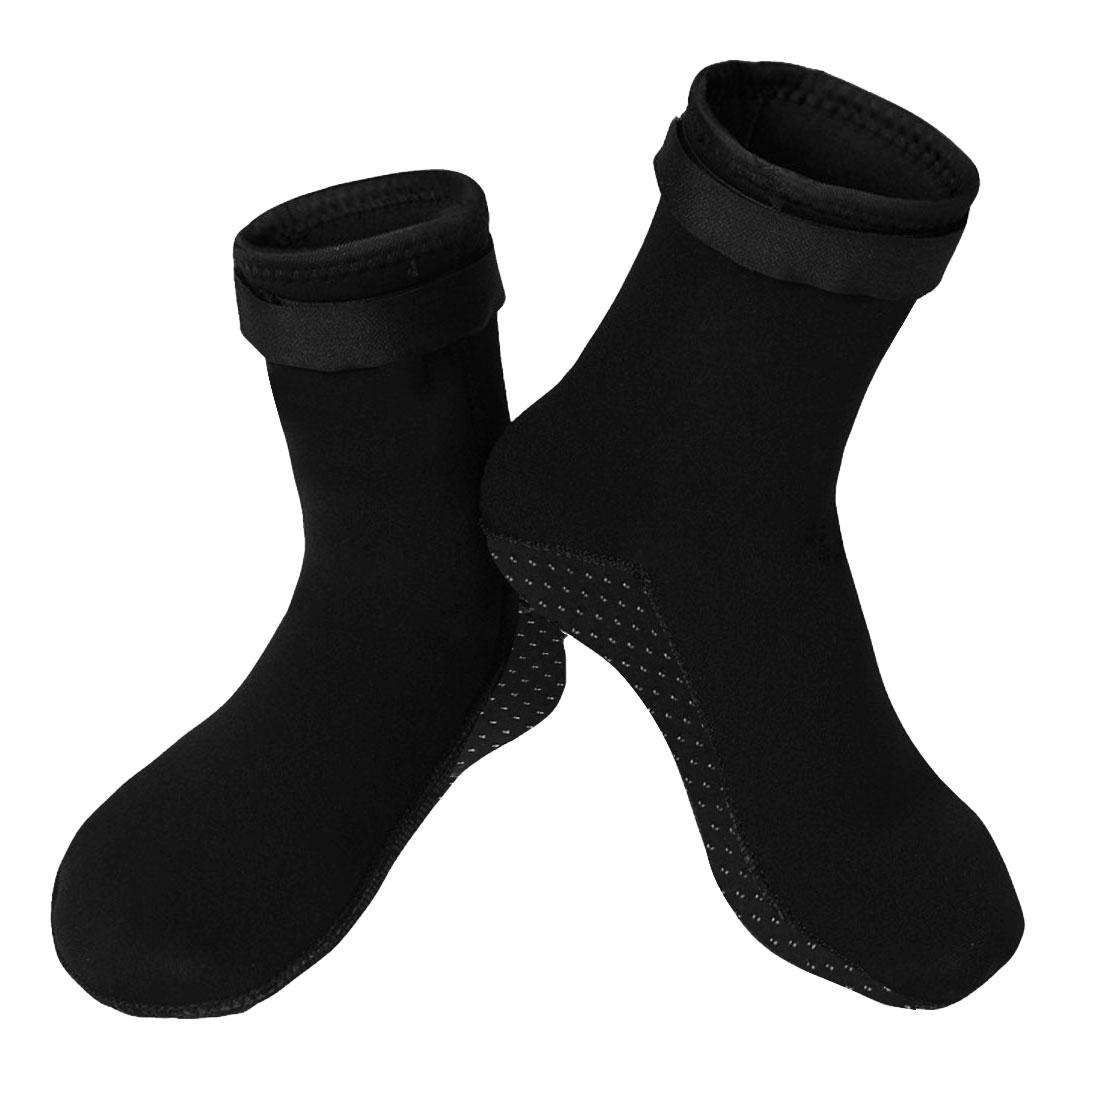 Pair Black Detachable Closure Neoprene Dive Water Skiing Diving Shoes XS